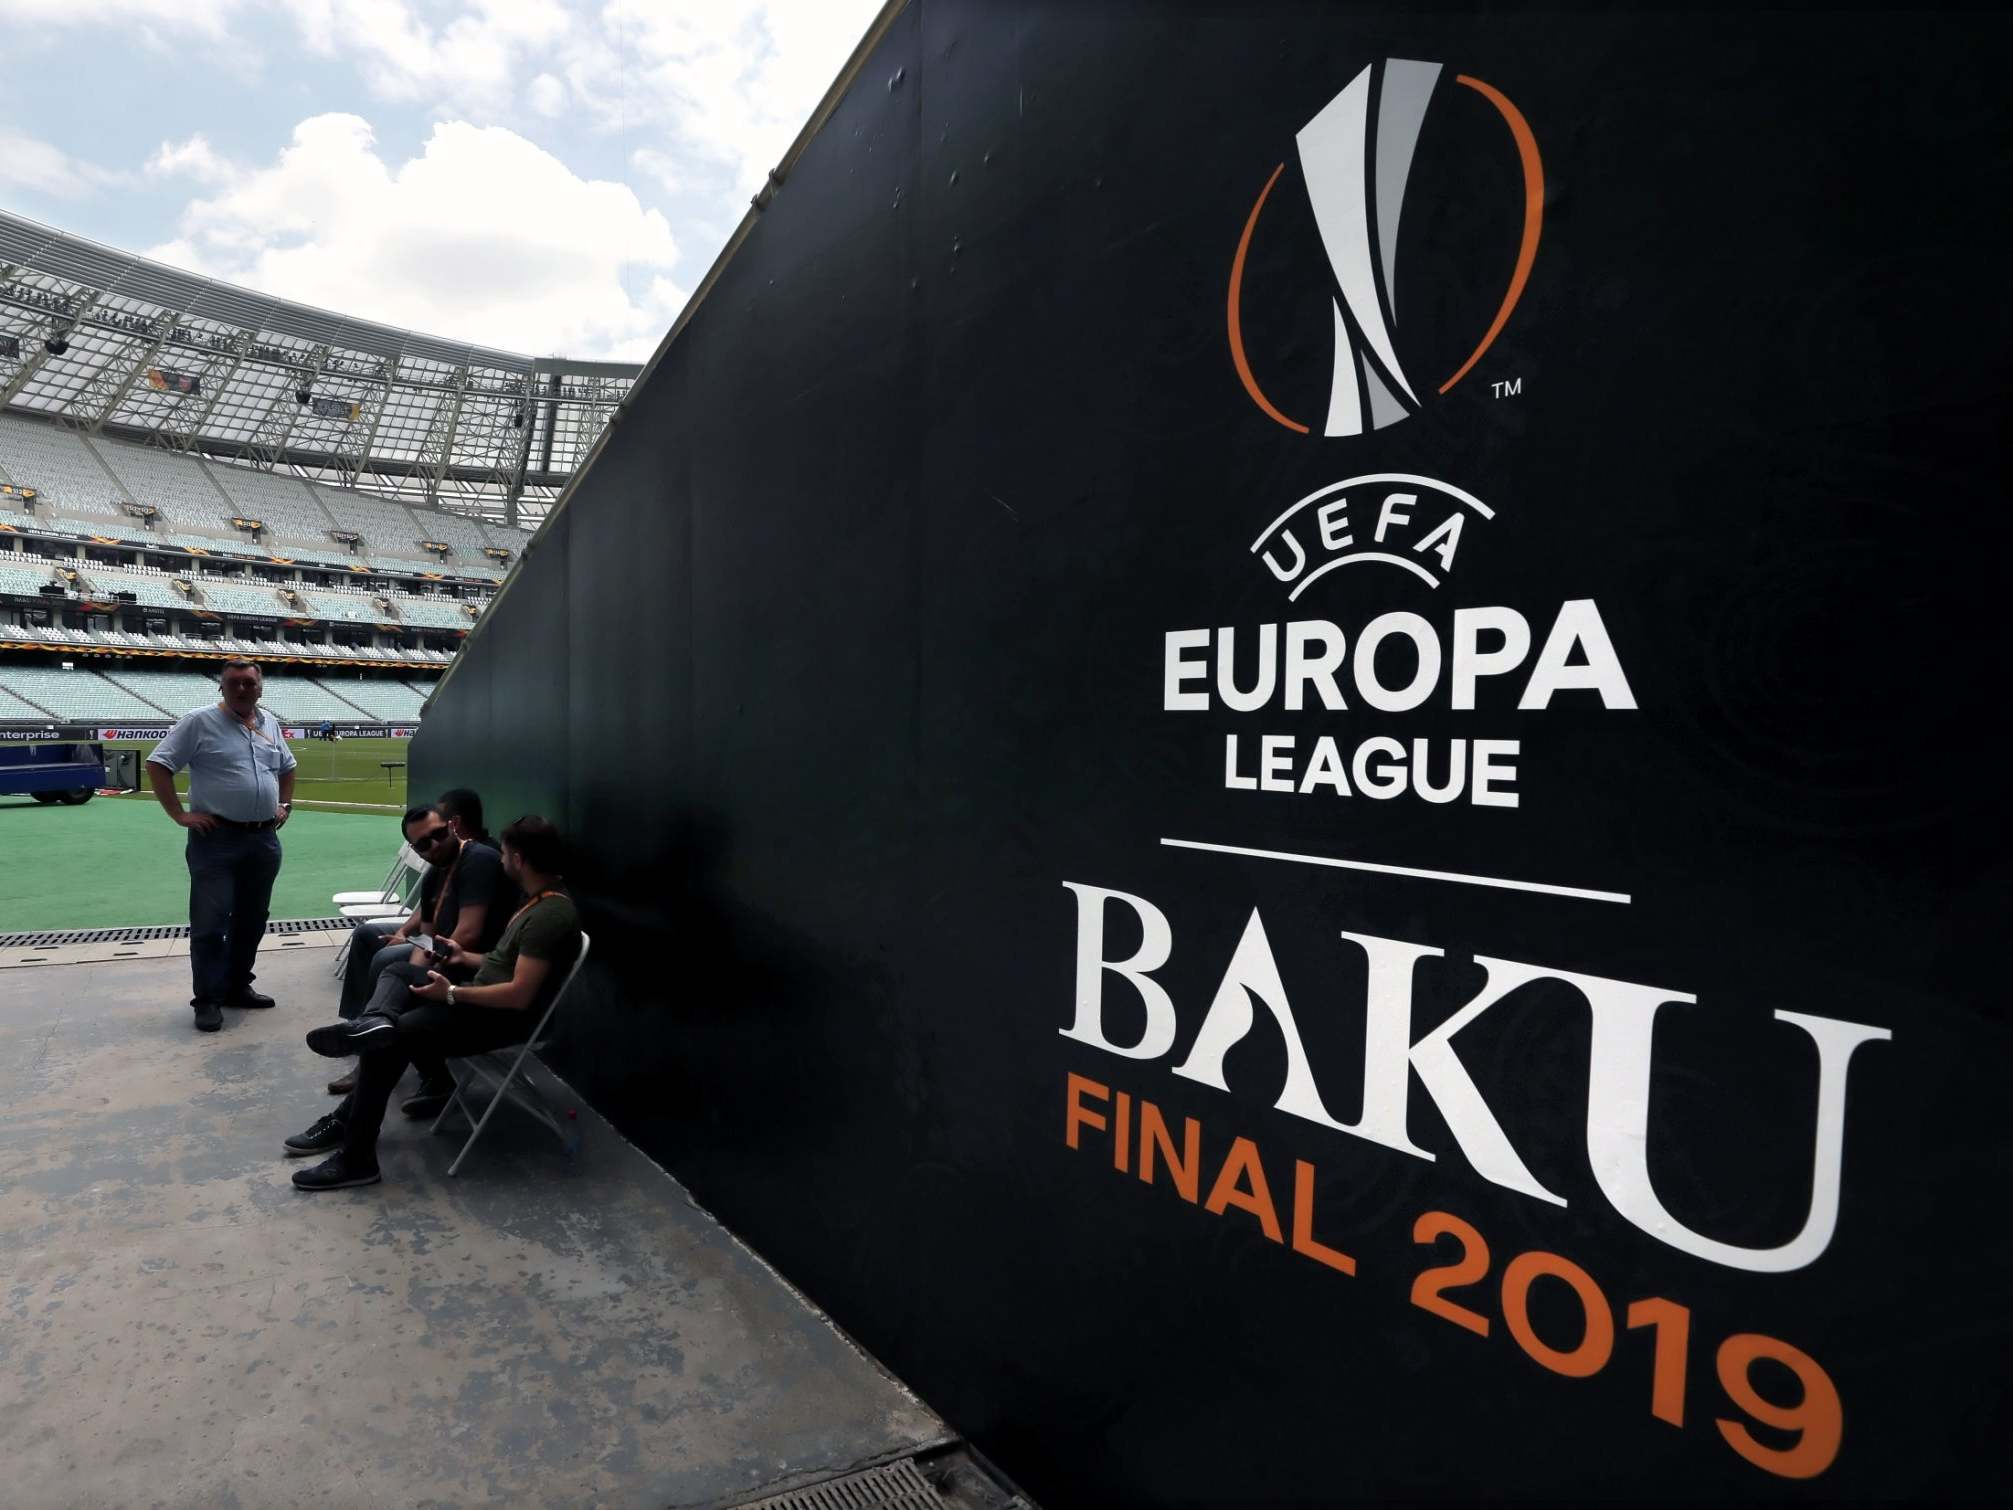 Baku is a serious football trip that demands military